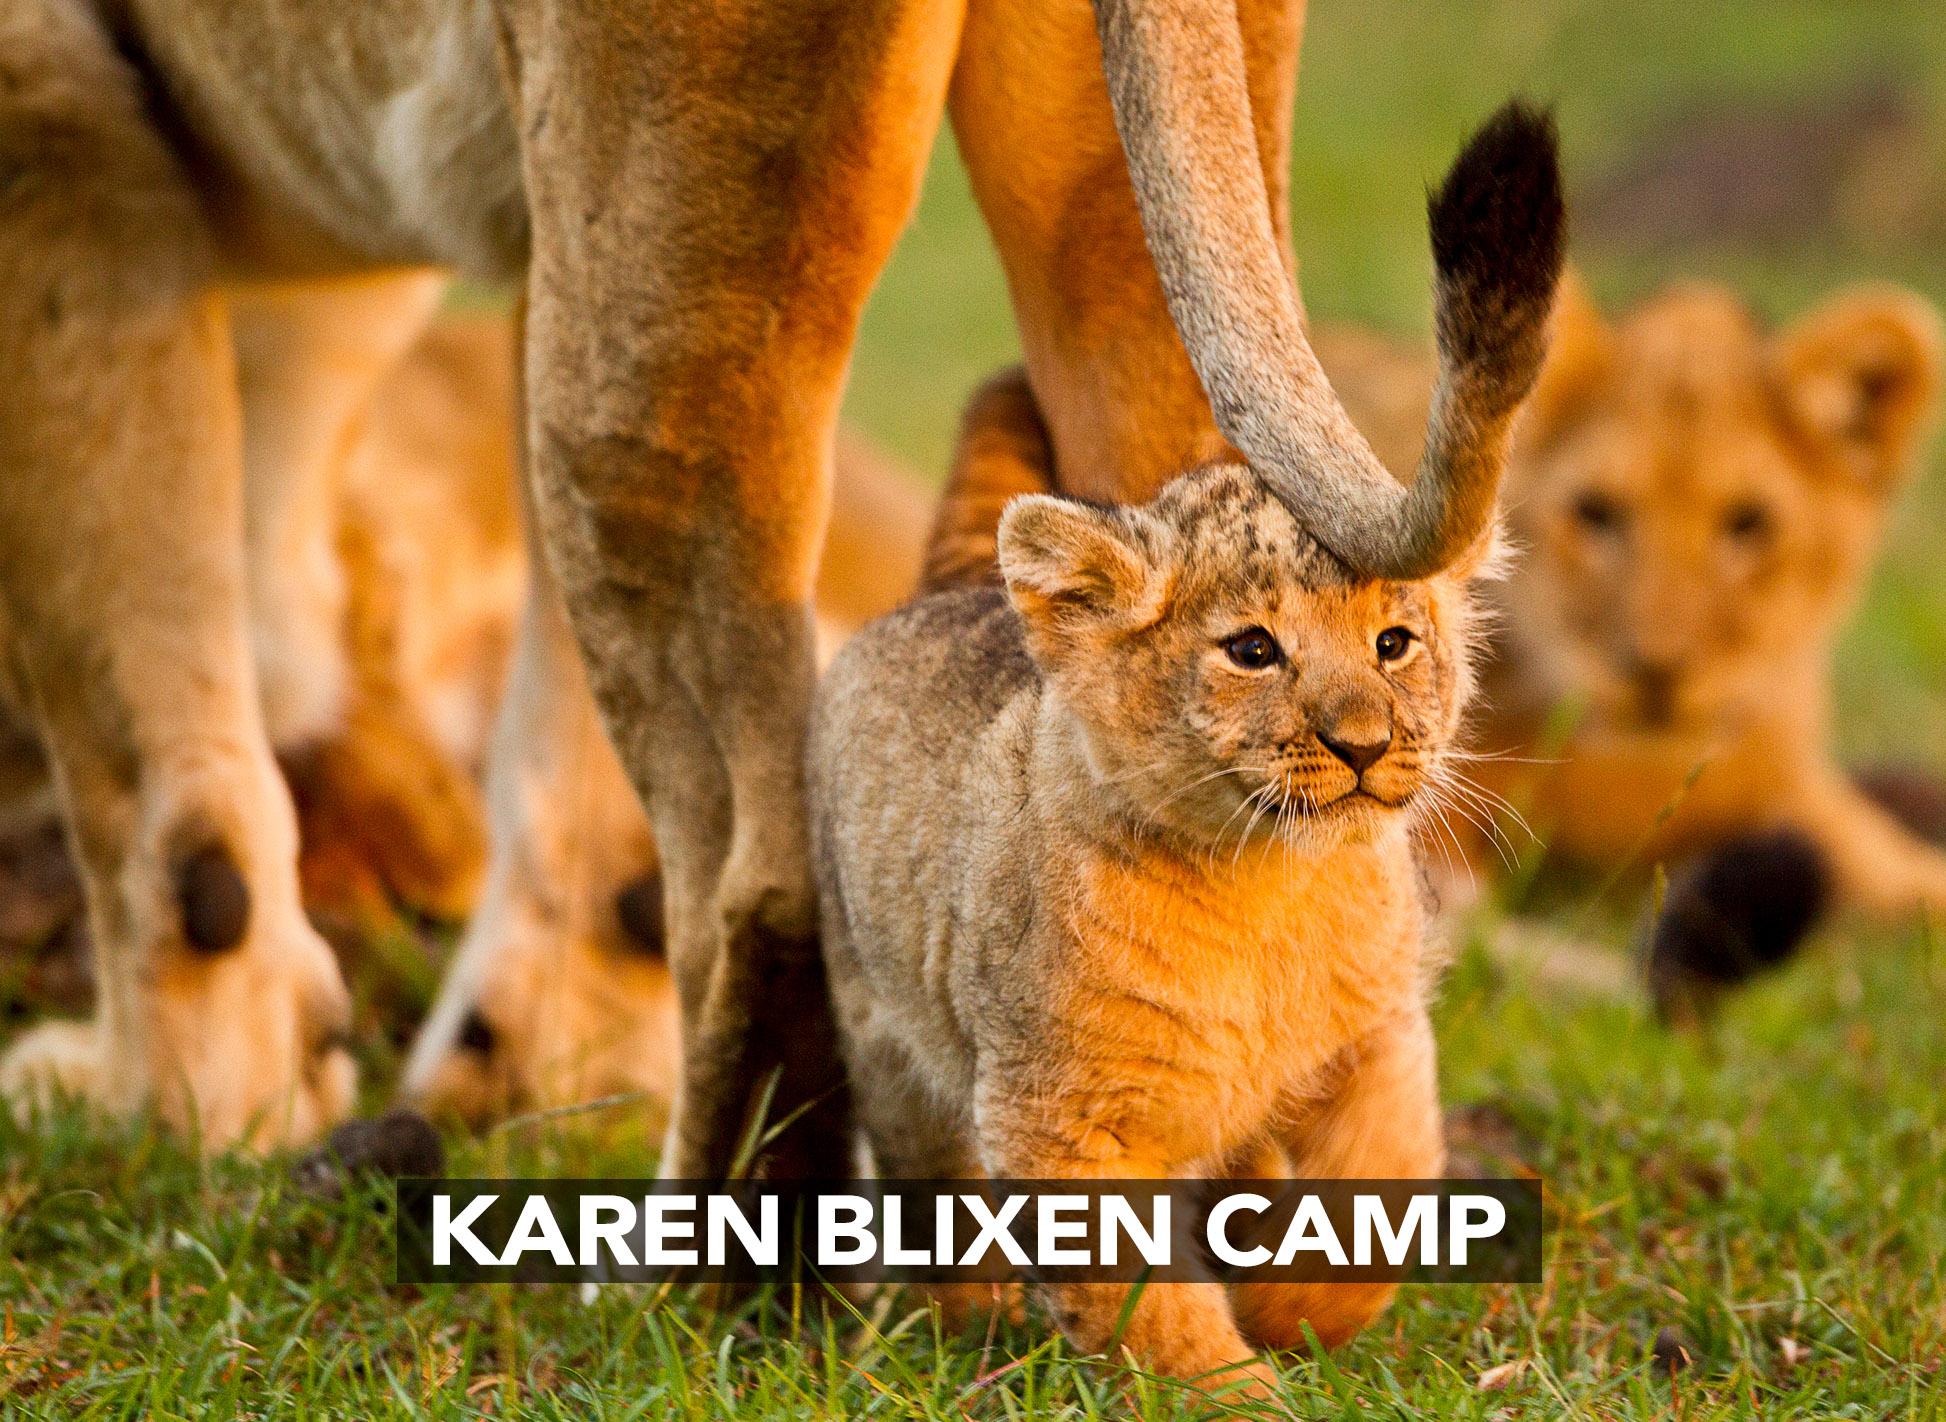 KAREN BLIXON CAMP